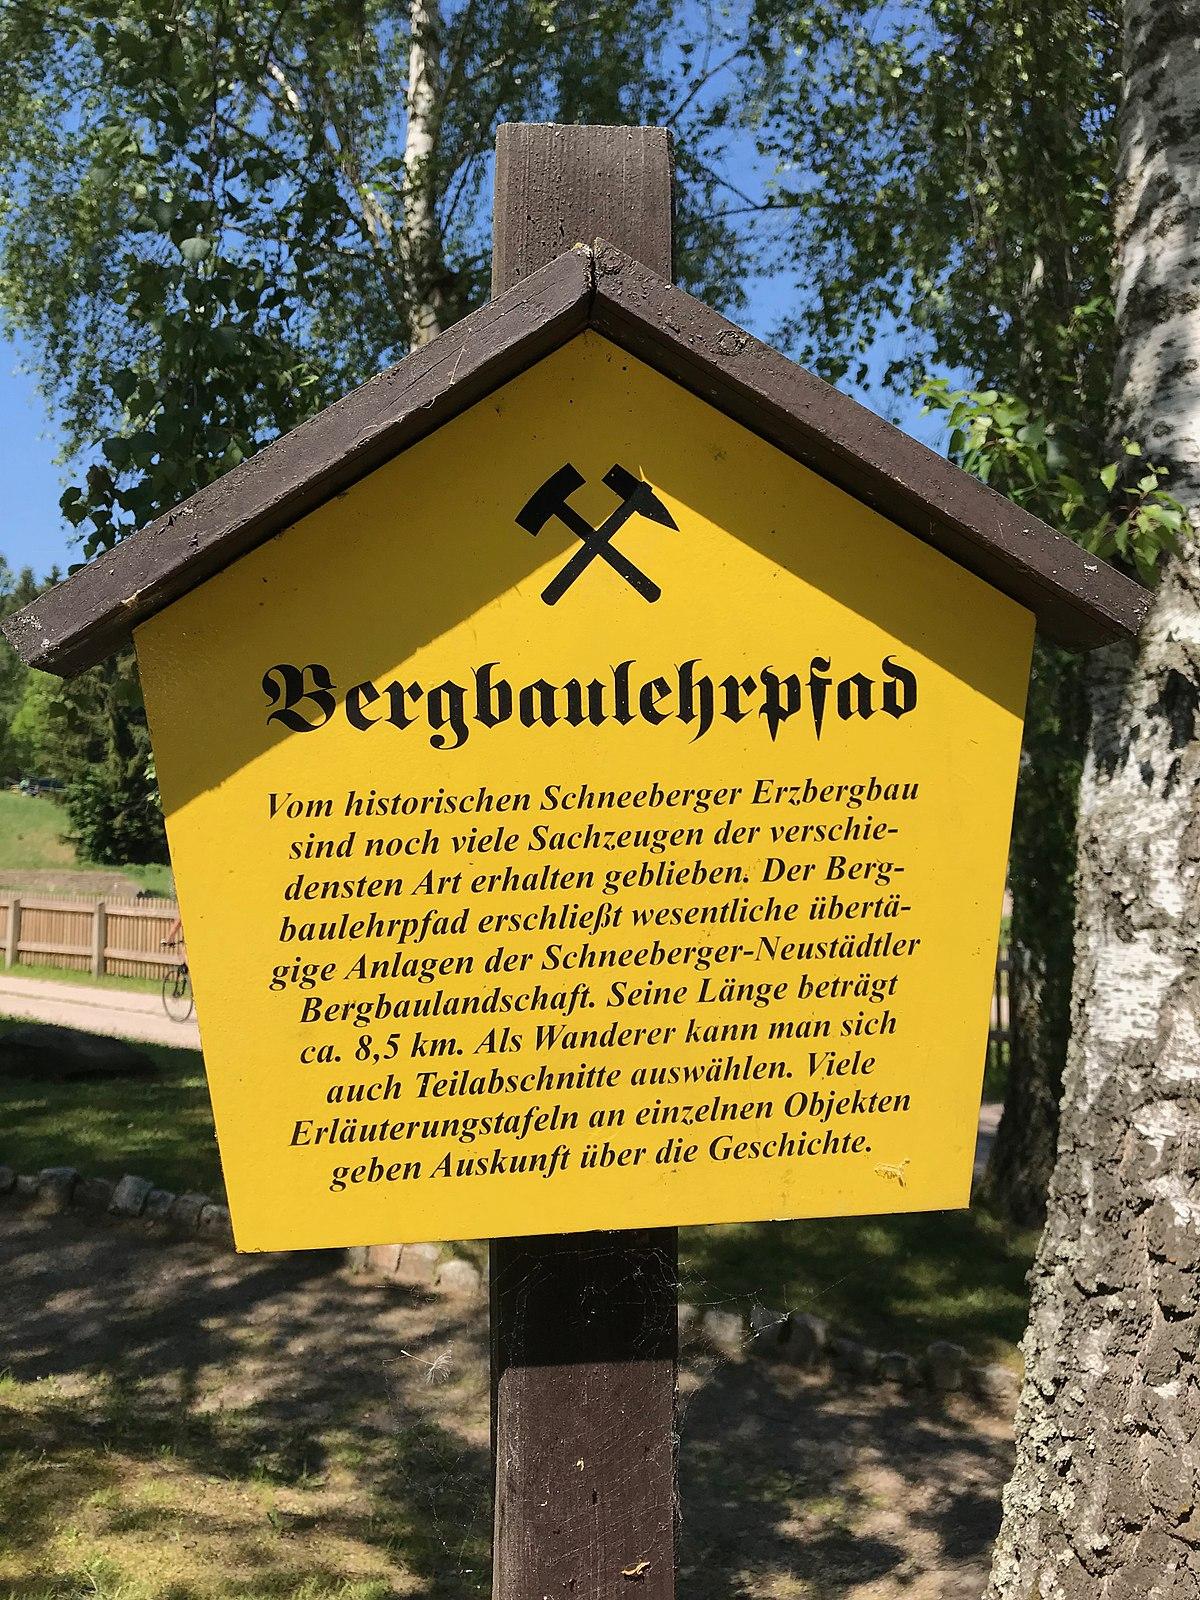 Bergbaulehrpfad schneeberg neust dtel wikipedia for Gelbe tafeln